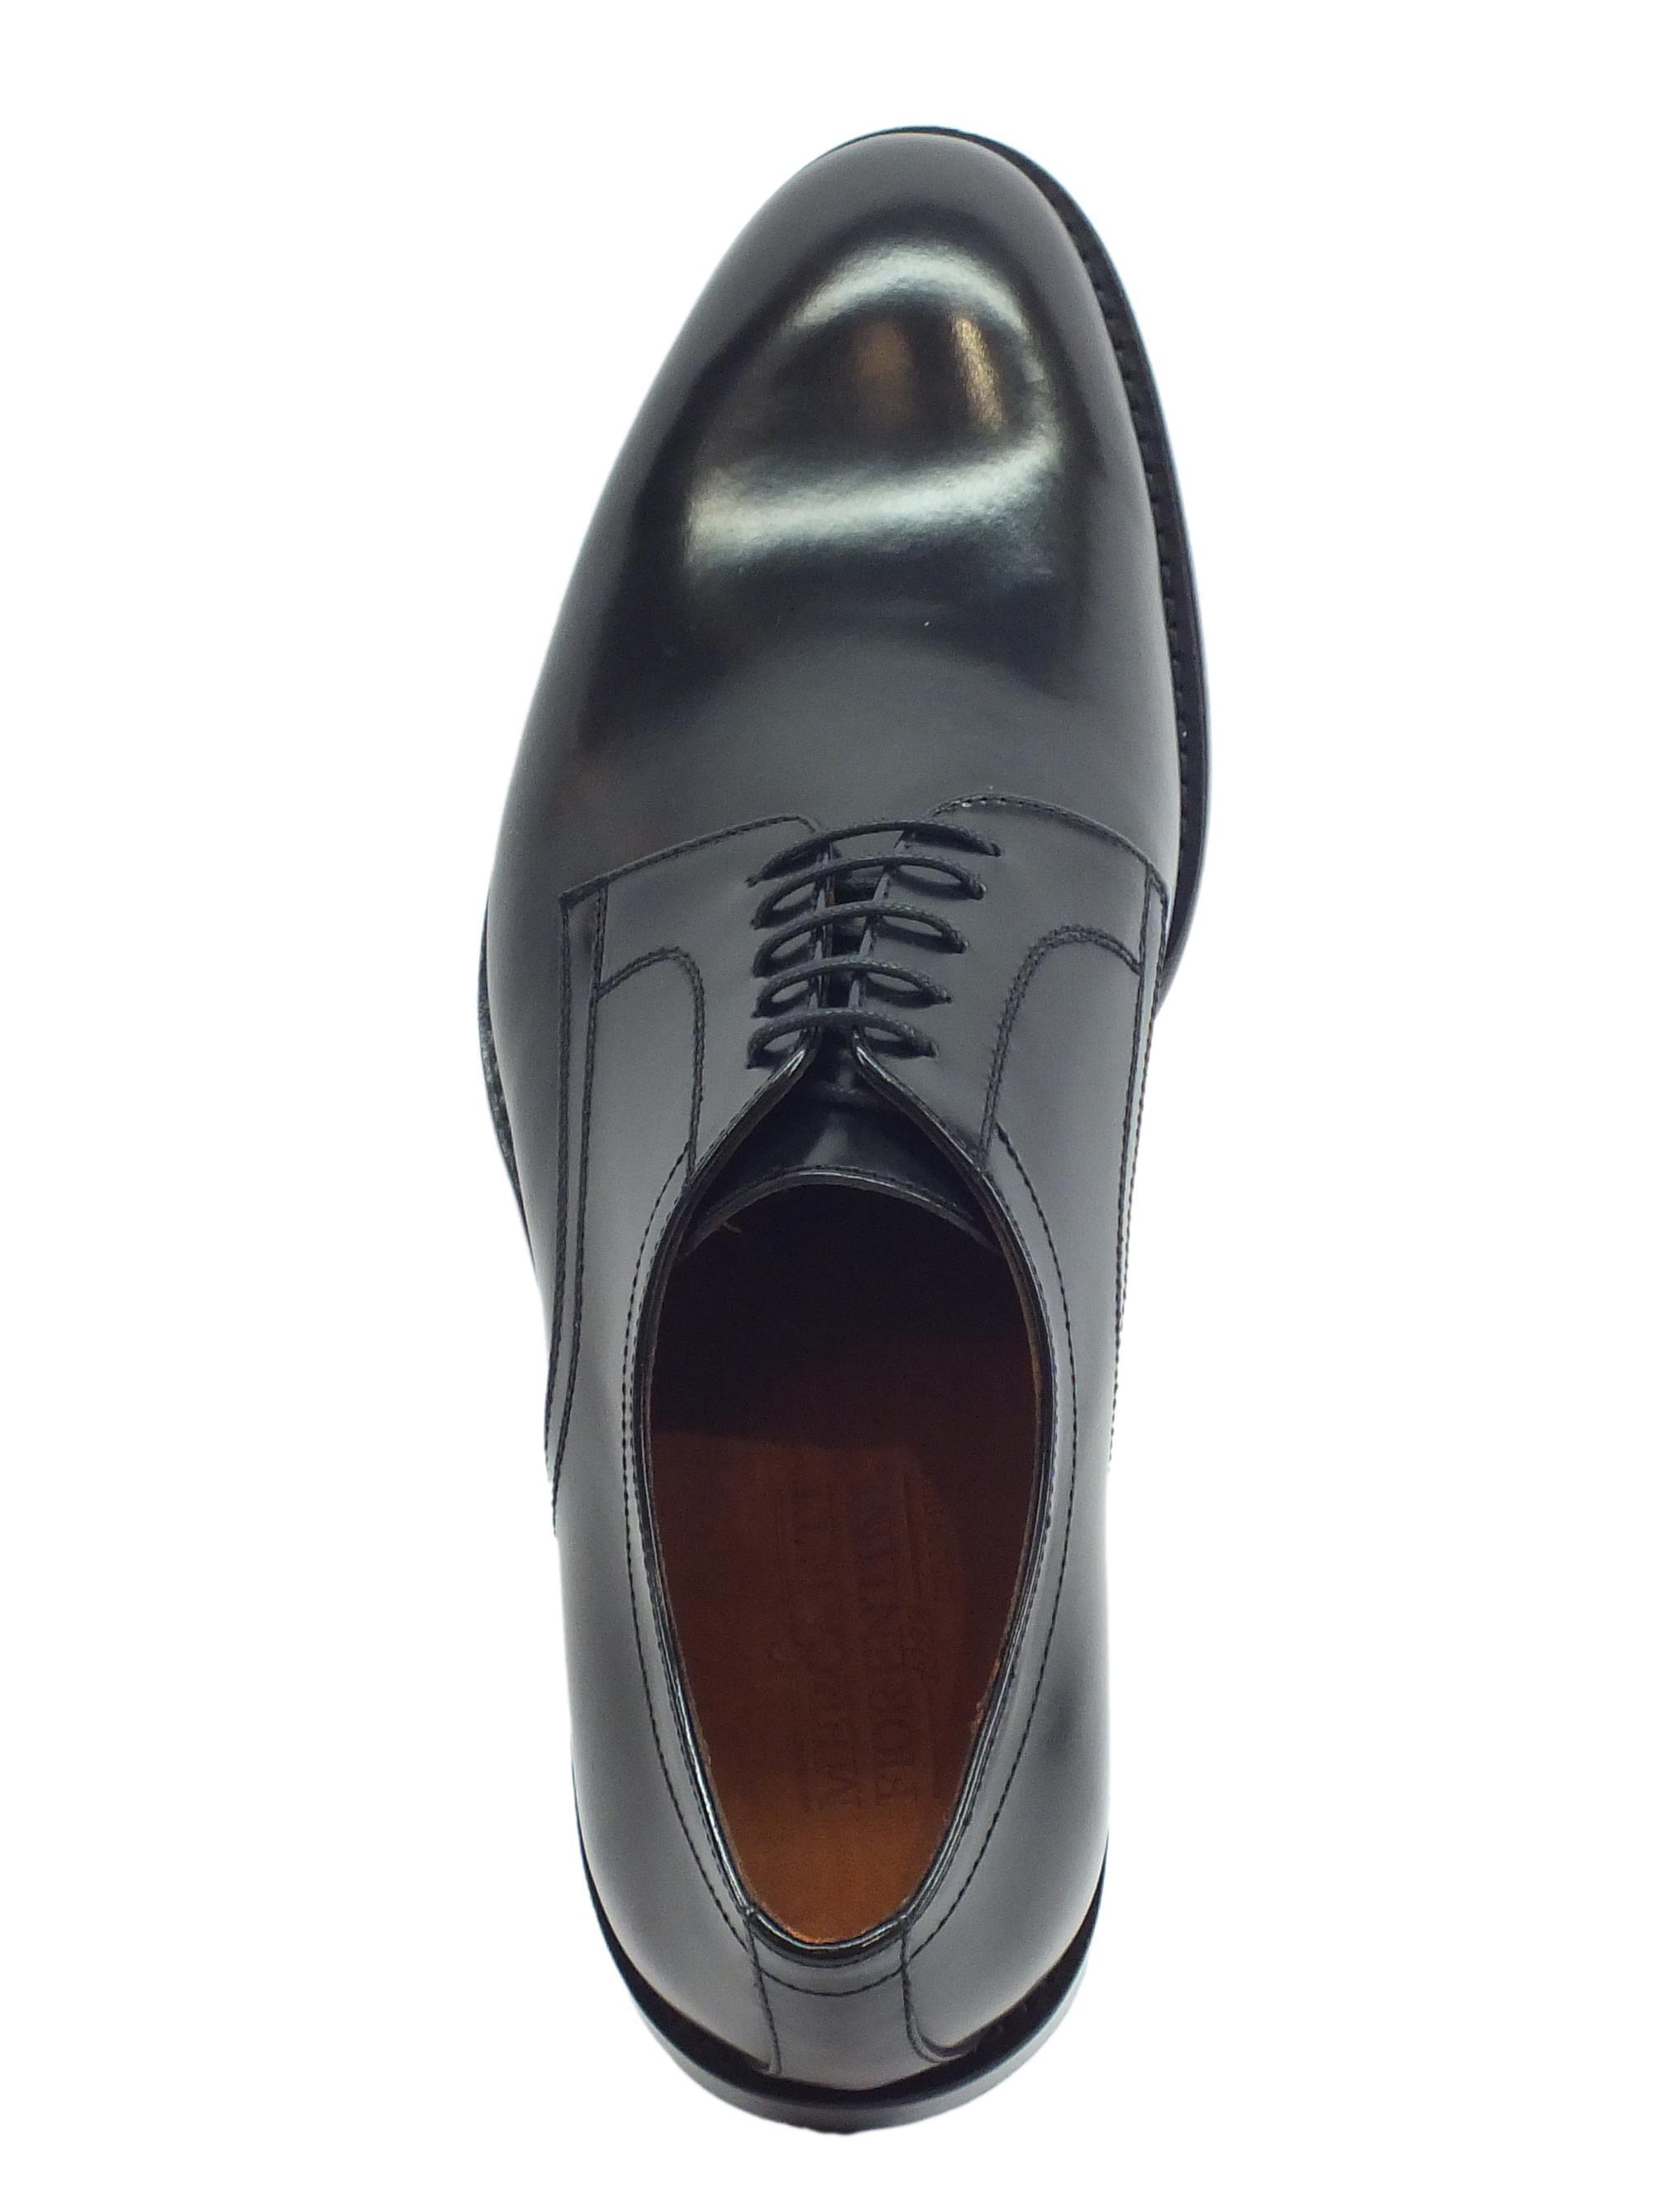 ... Scarpe eleganti per uomo Mercanti Fiorentini in pelle abrasivata nera 706b7808f25